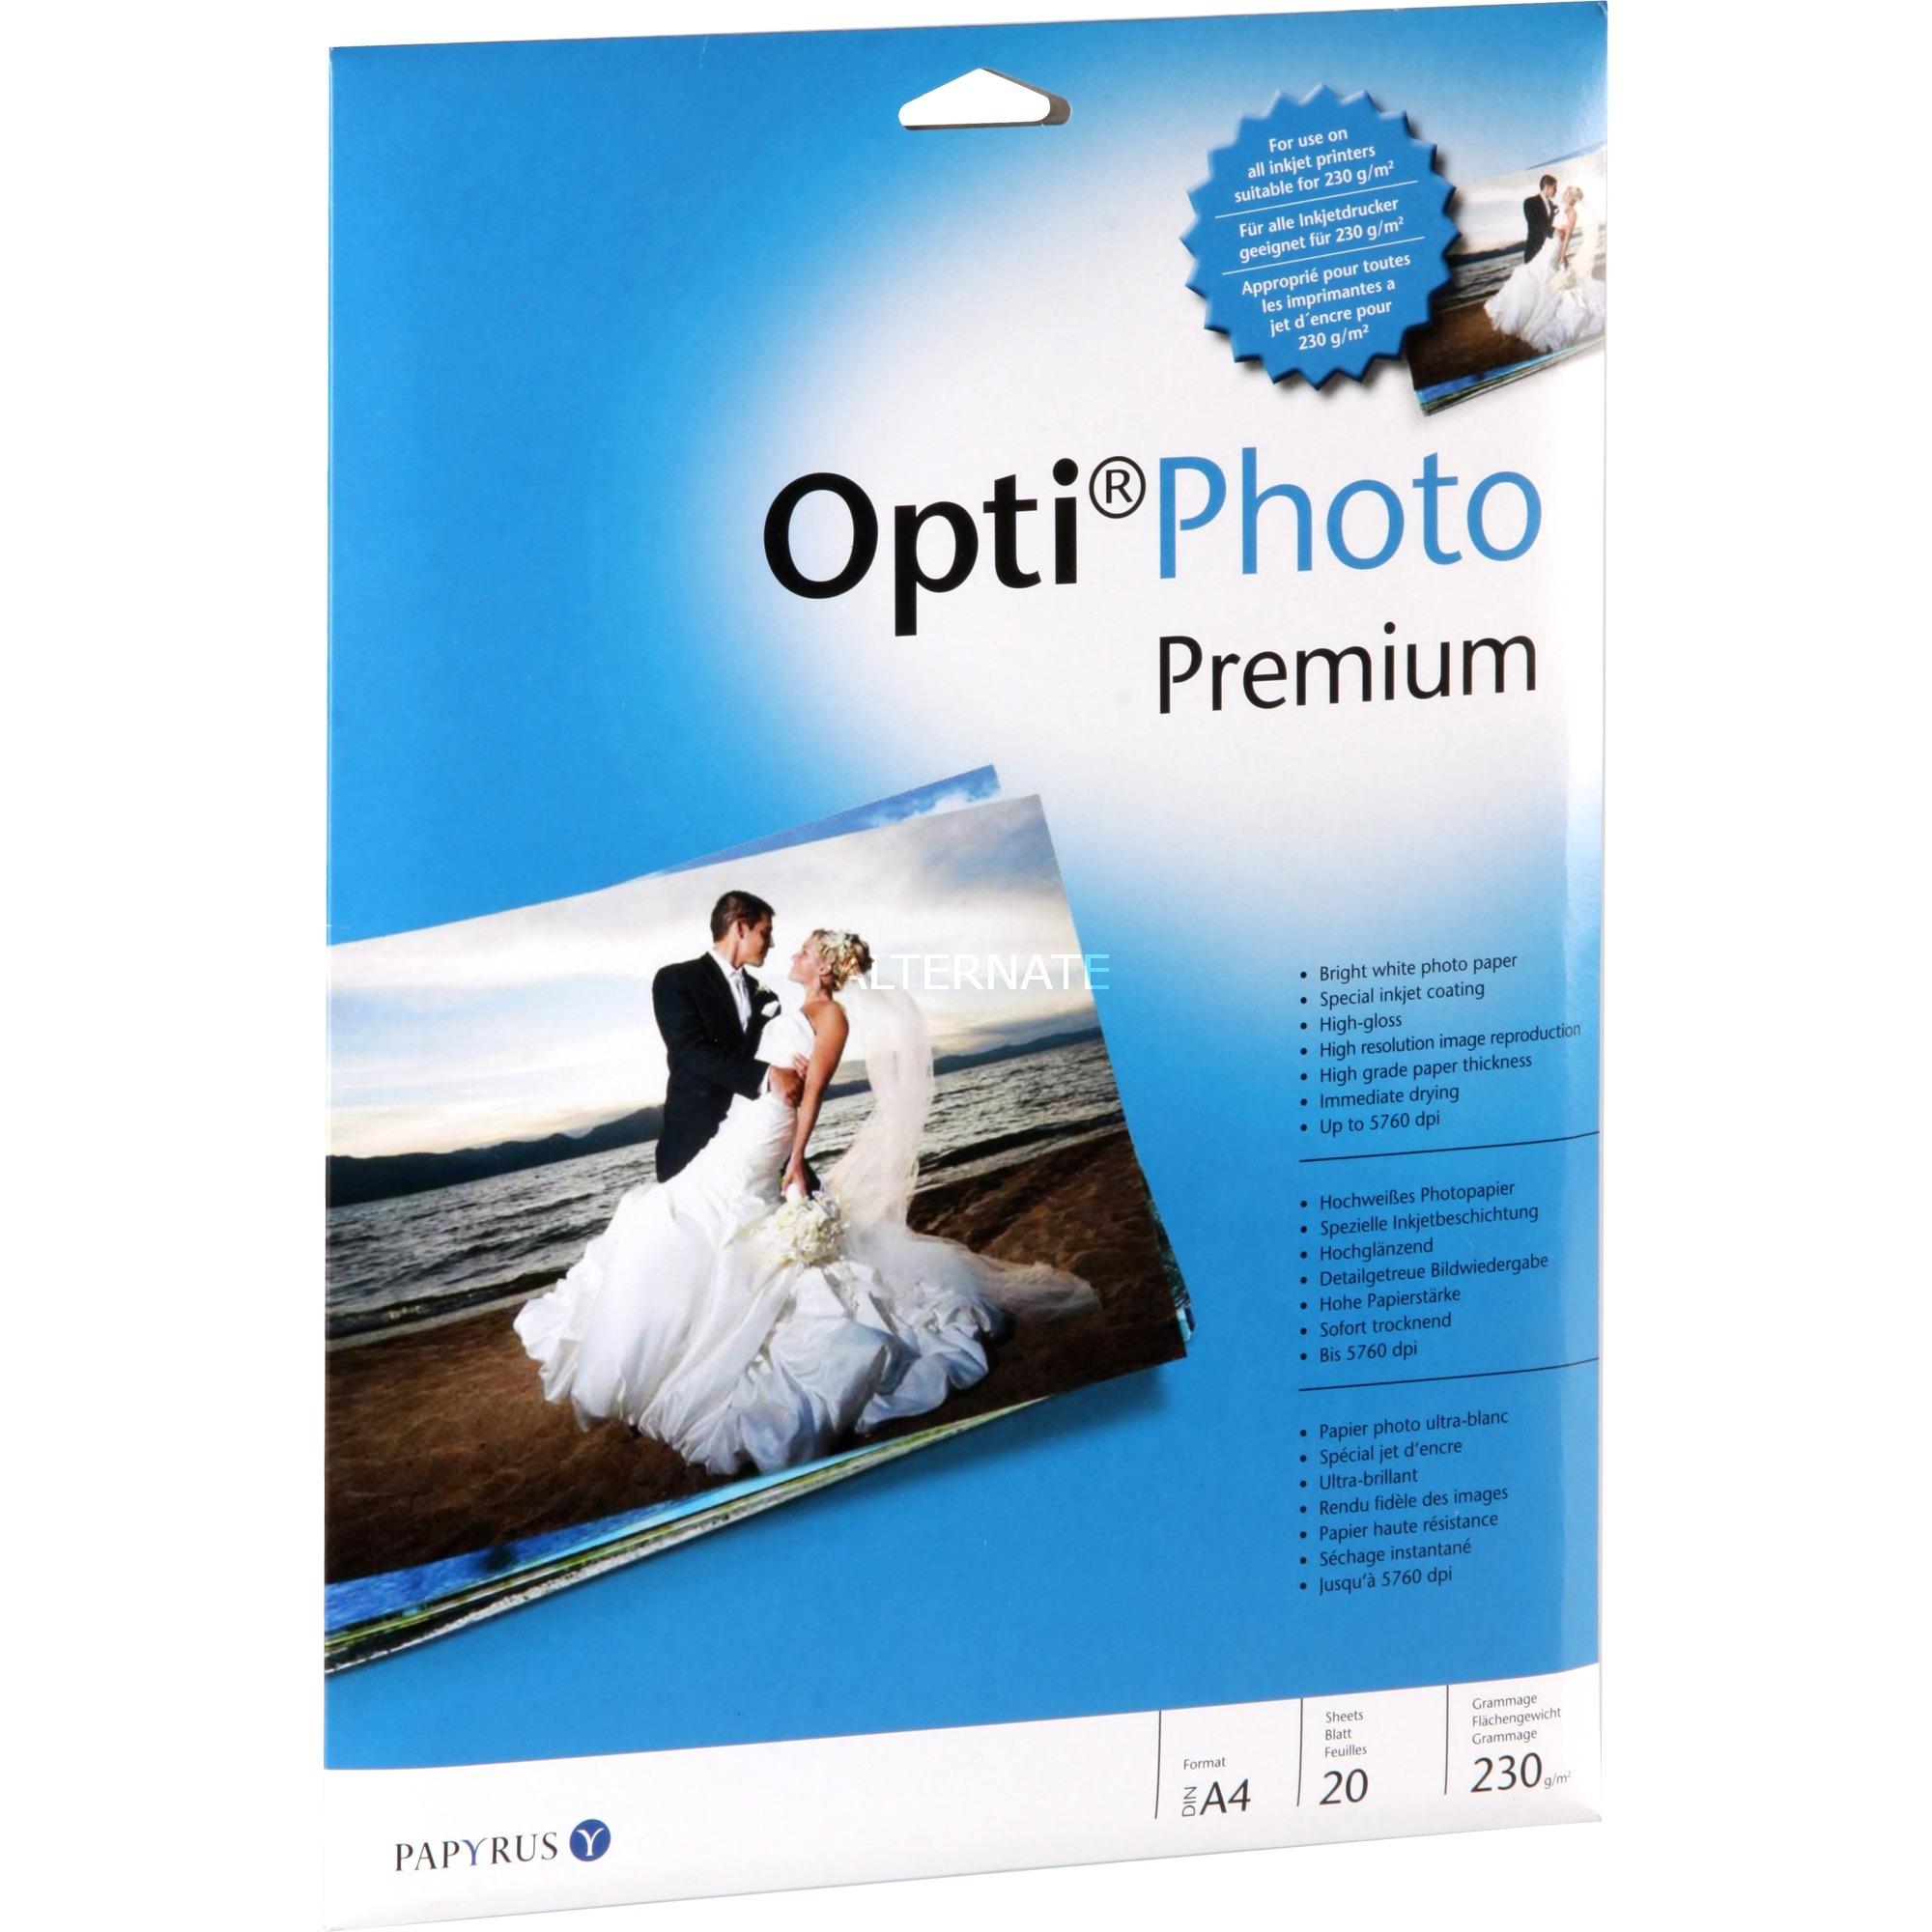 Opti Photo Premium papel fotográfico Blanco De alto brillo A4